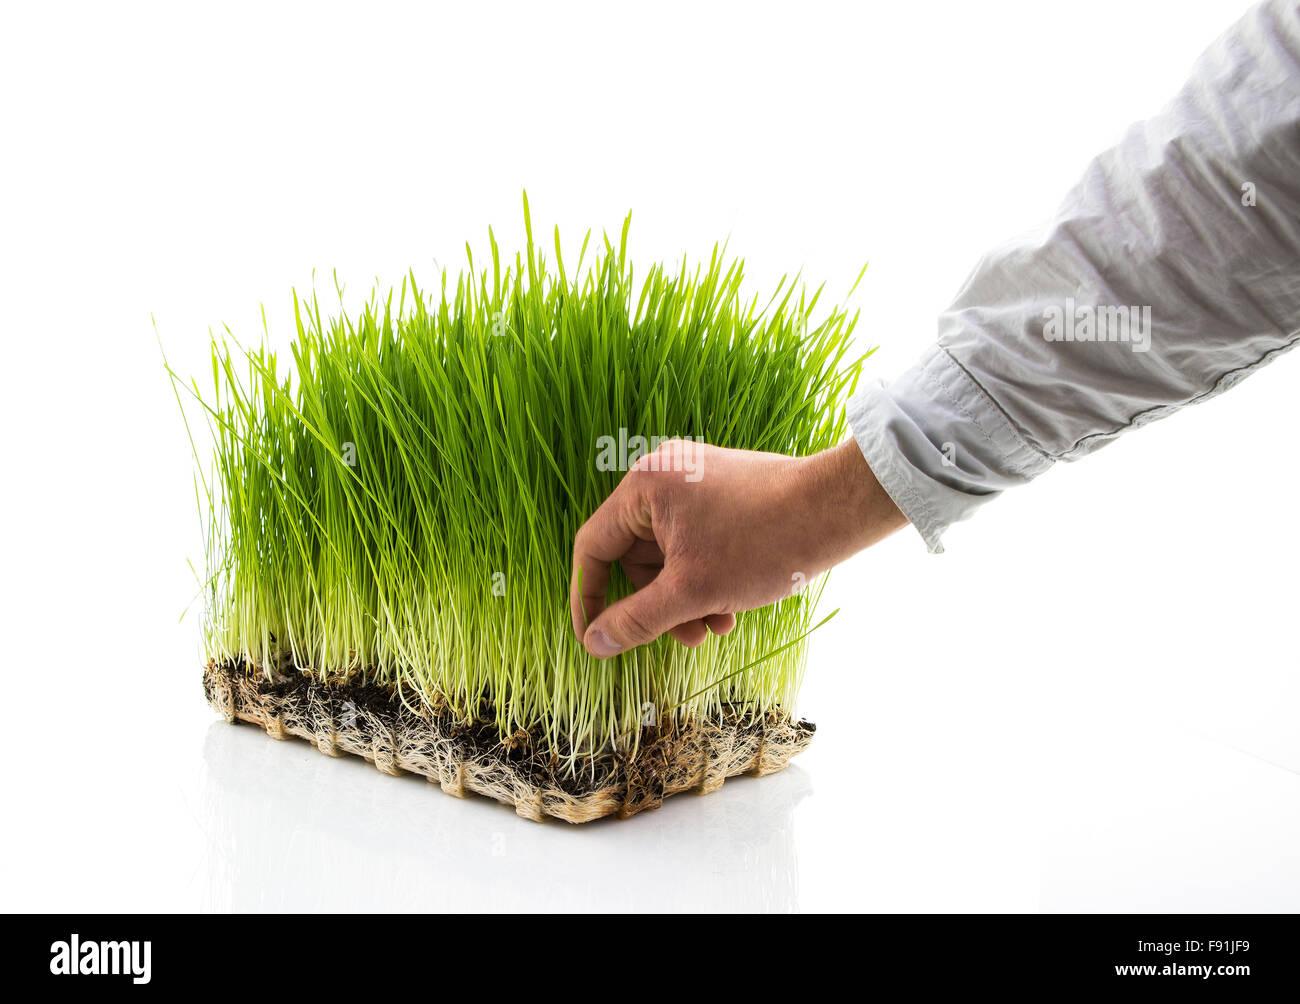 Man Picks Homegrown Wheatgrass on a white background - Stock Image